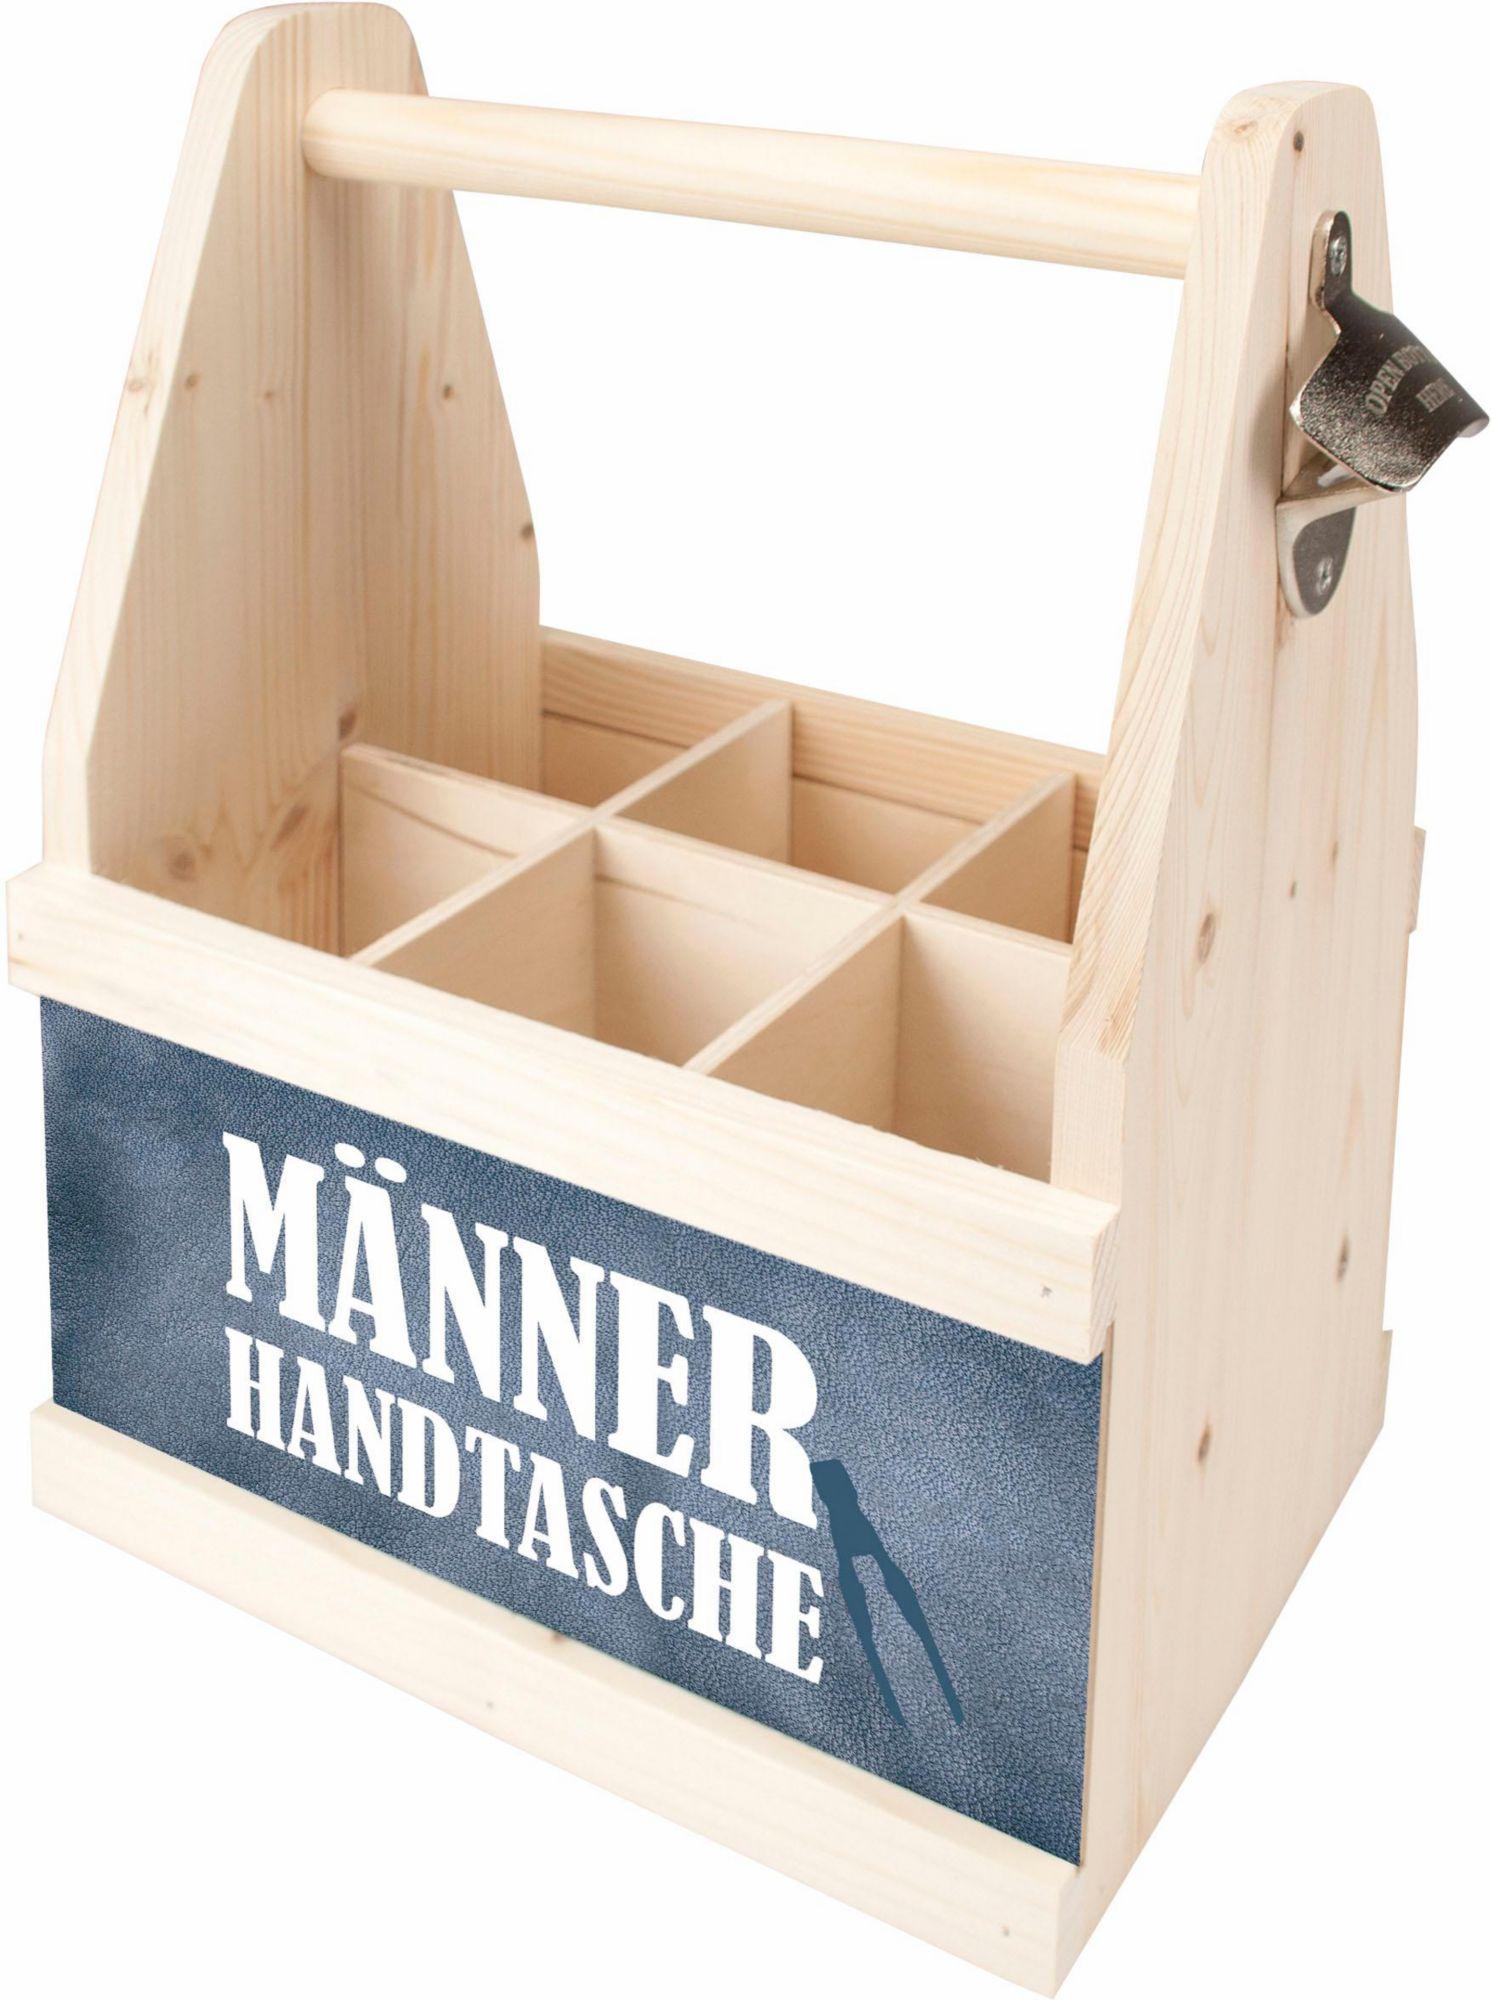 CONTENTO Contento Bier Caddy »Männer Handtasche«, Holz